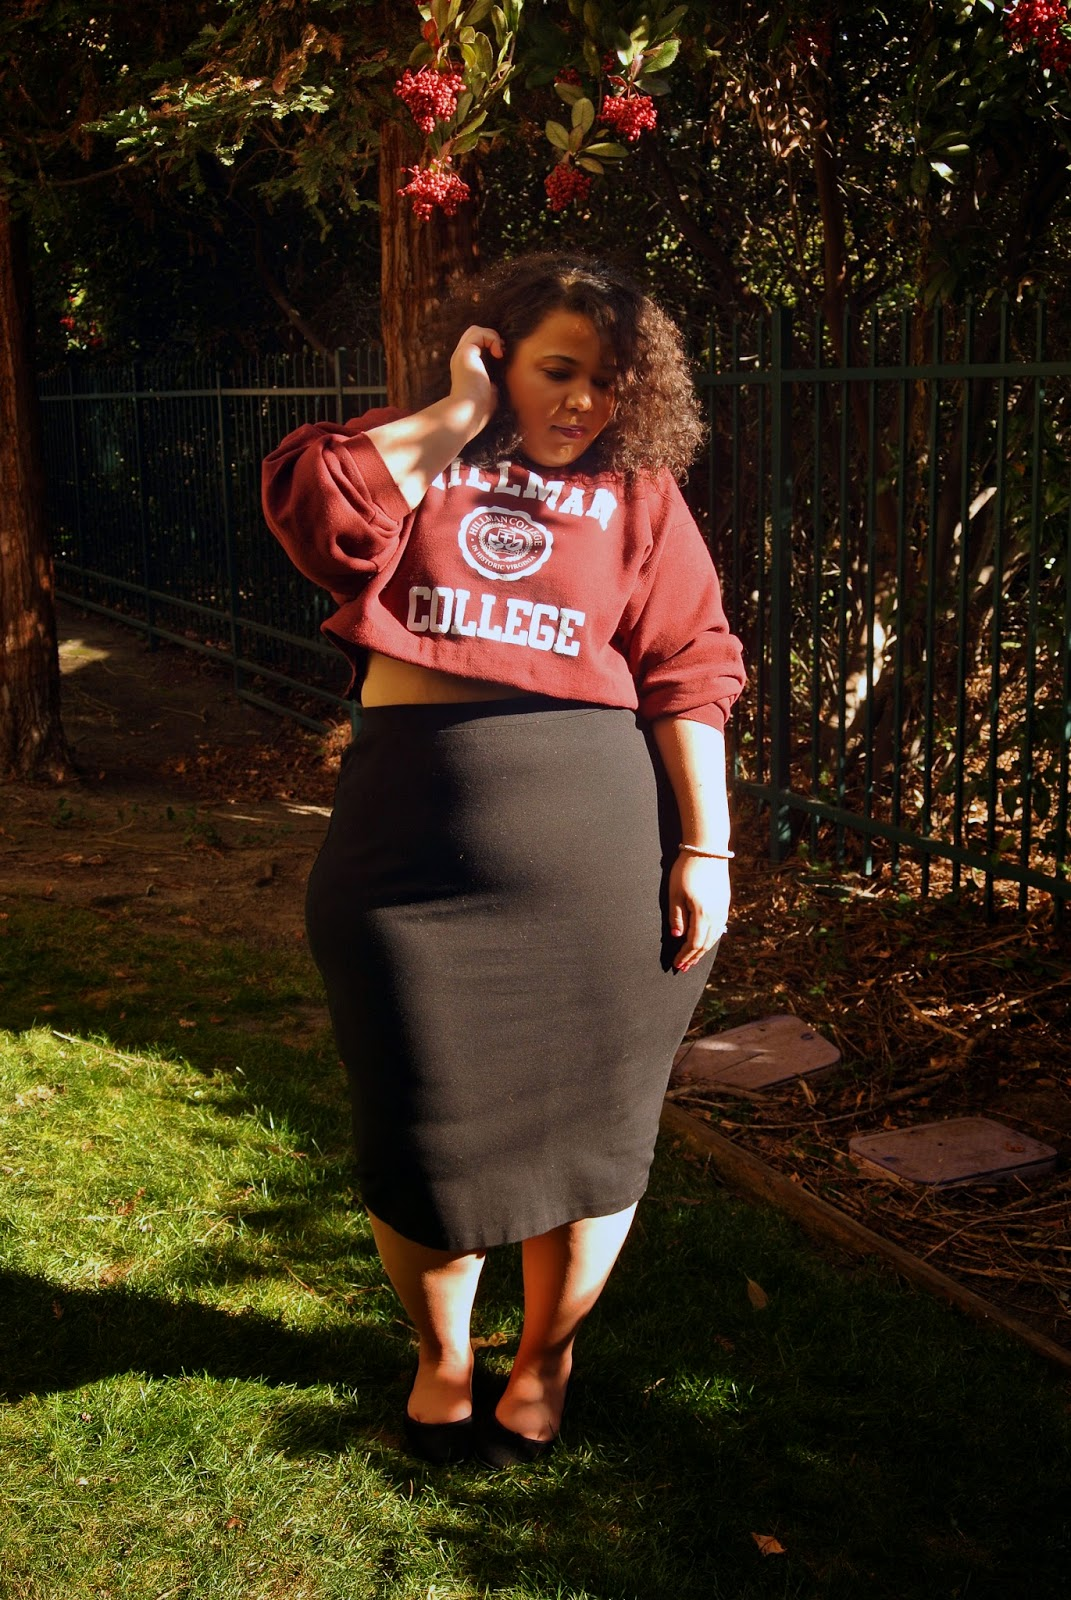 Hillman College Sweatshirt, A Different World, Plus size clothing